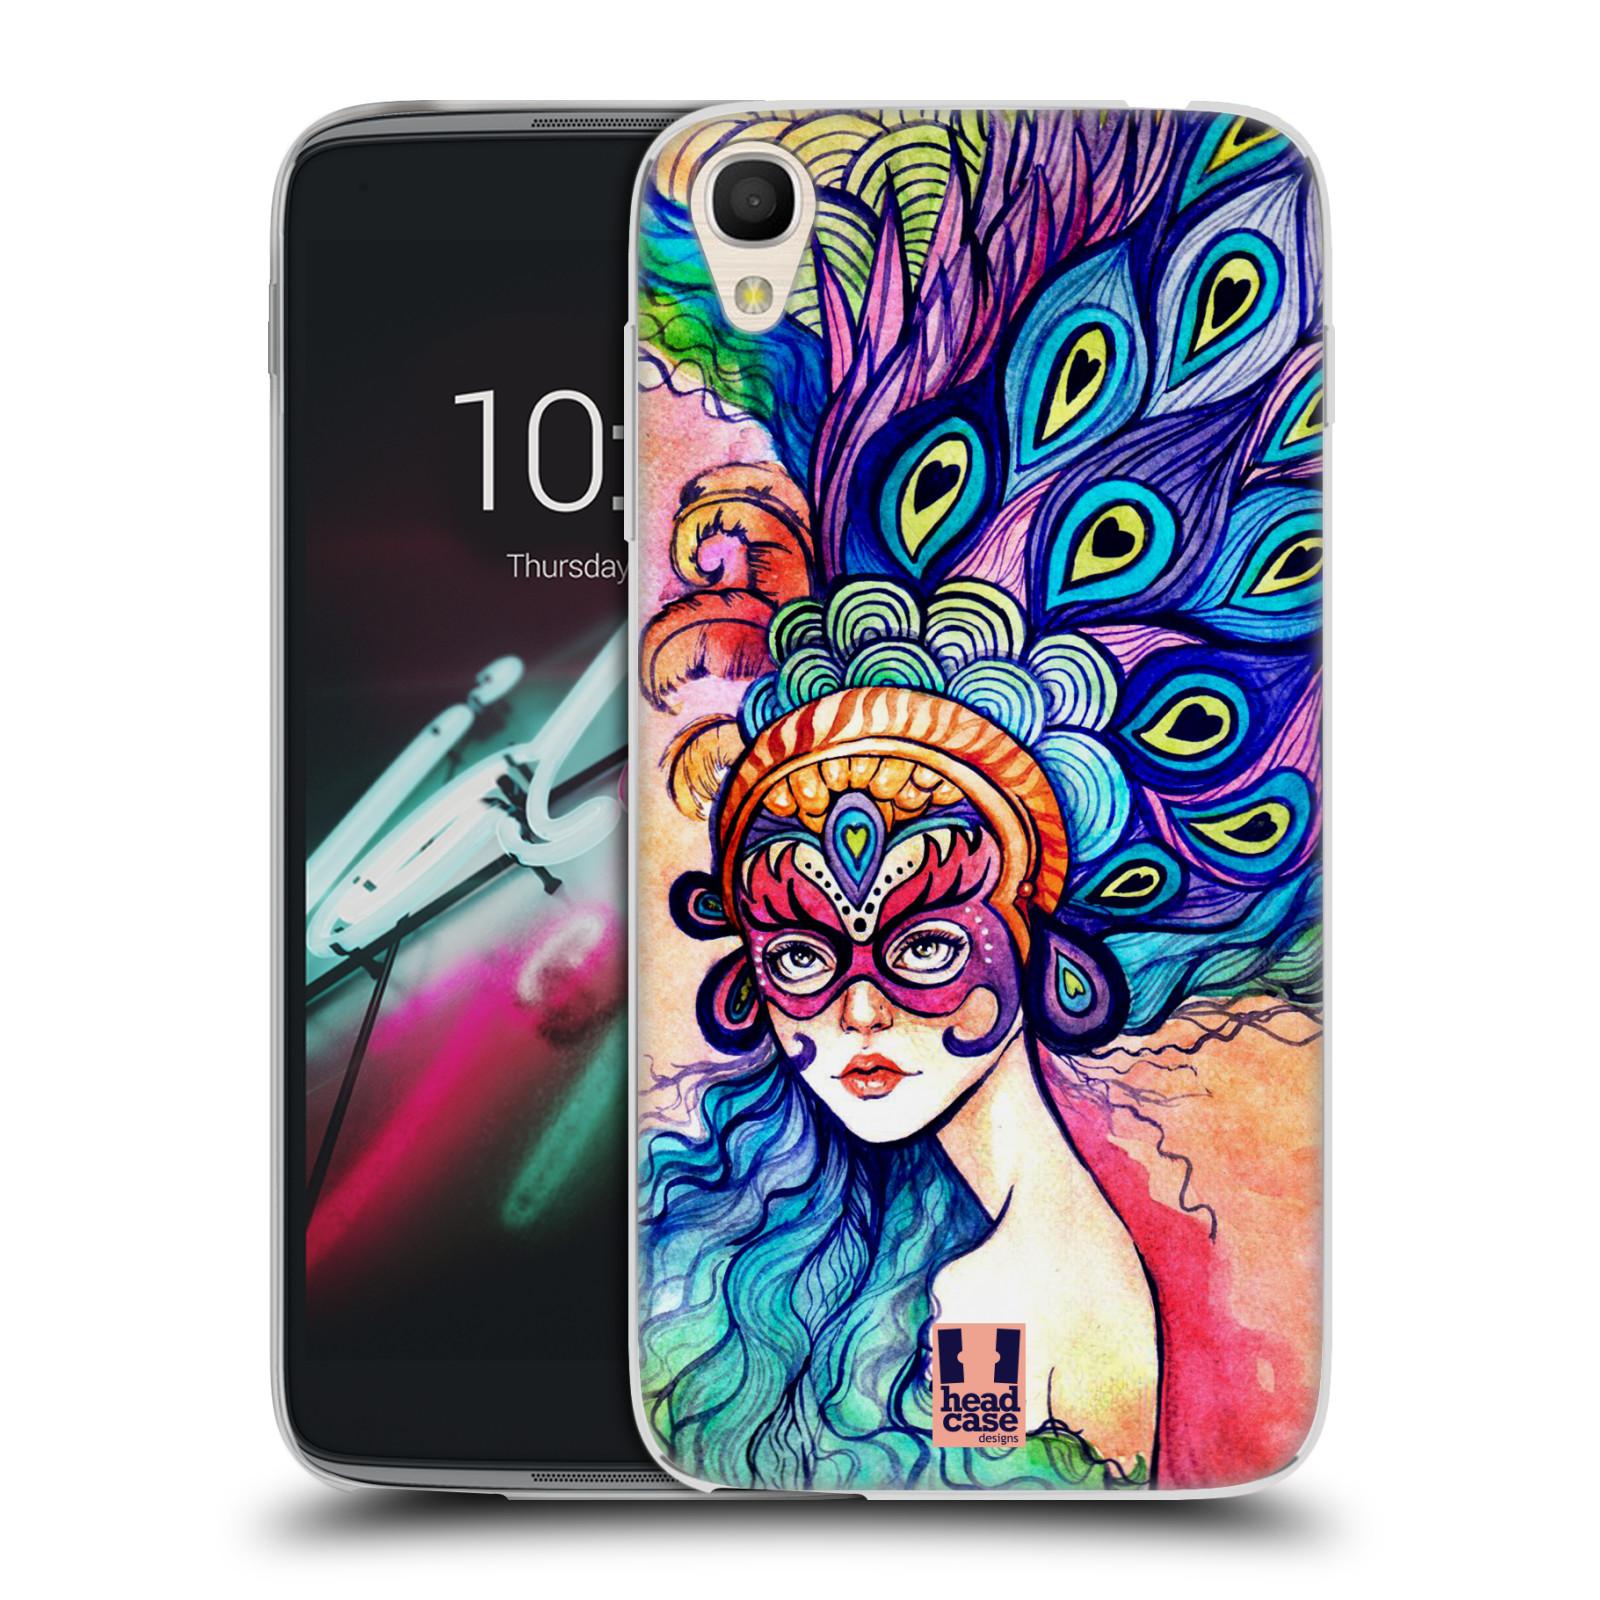 HEAD CASE silikonový obal na mobil Alcatel Idol 3 OT-6039Y (4.7) vzor Maškarní ples masky kreslené vzory MODRÉ PÍRKA